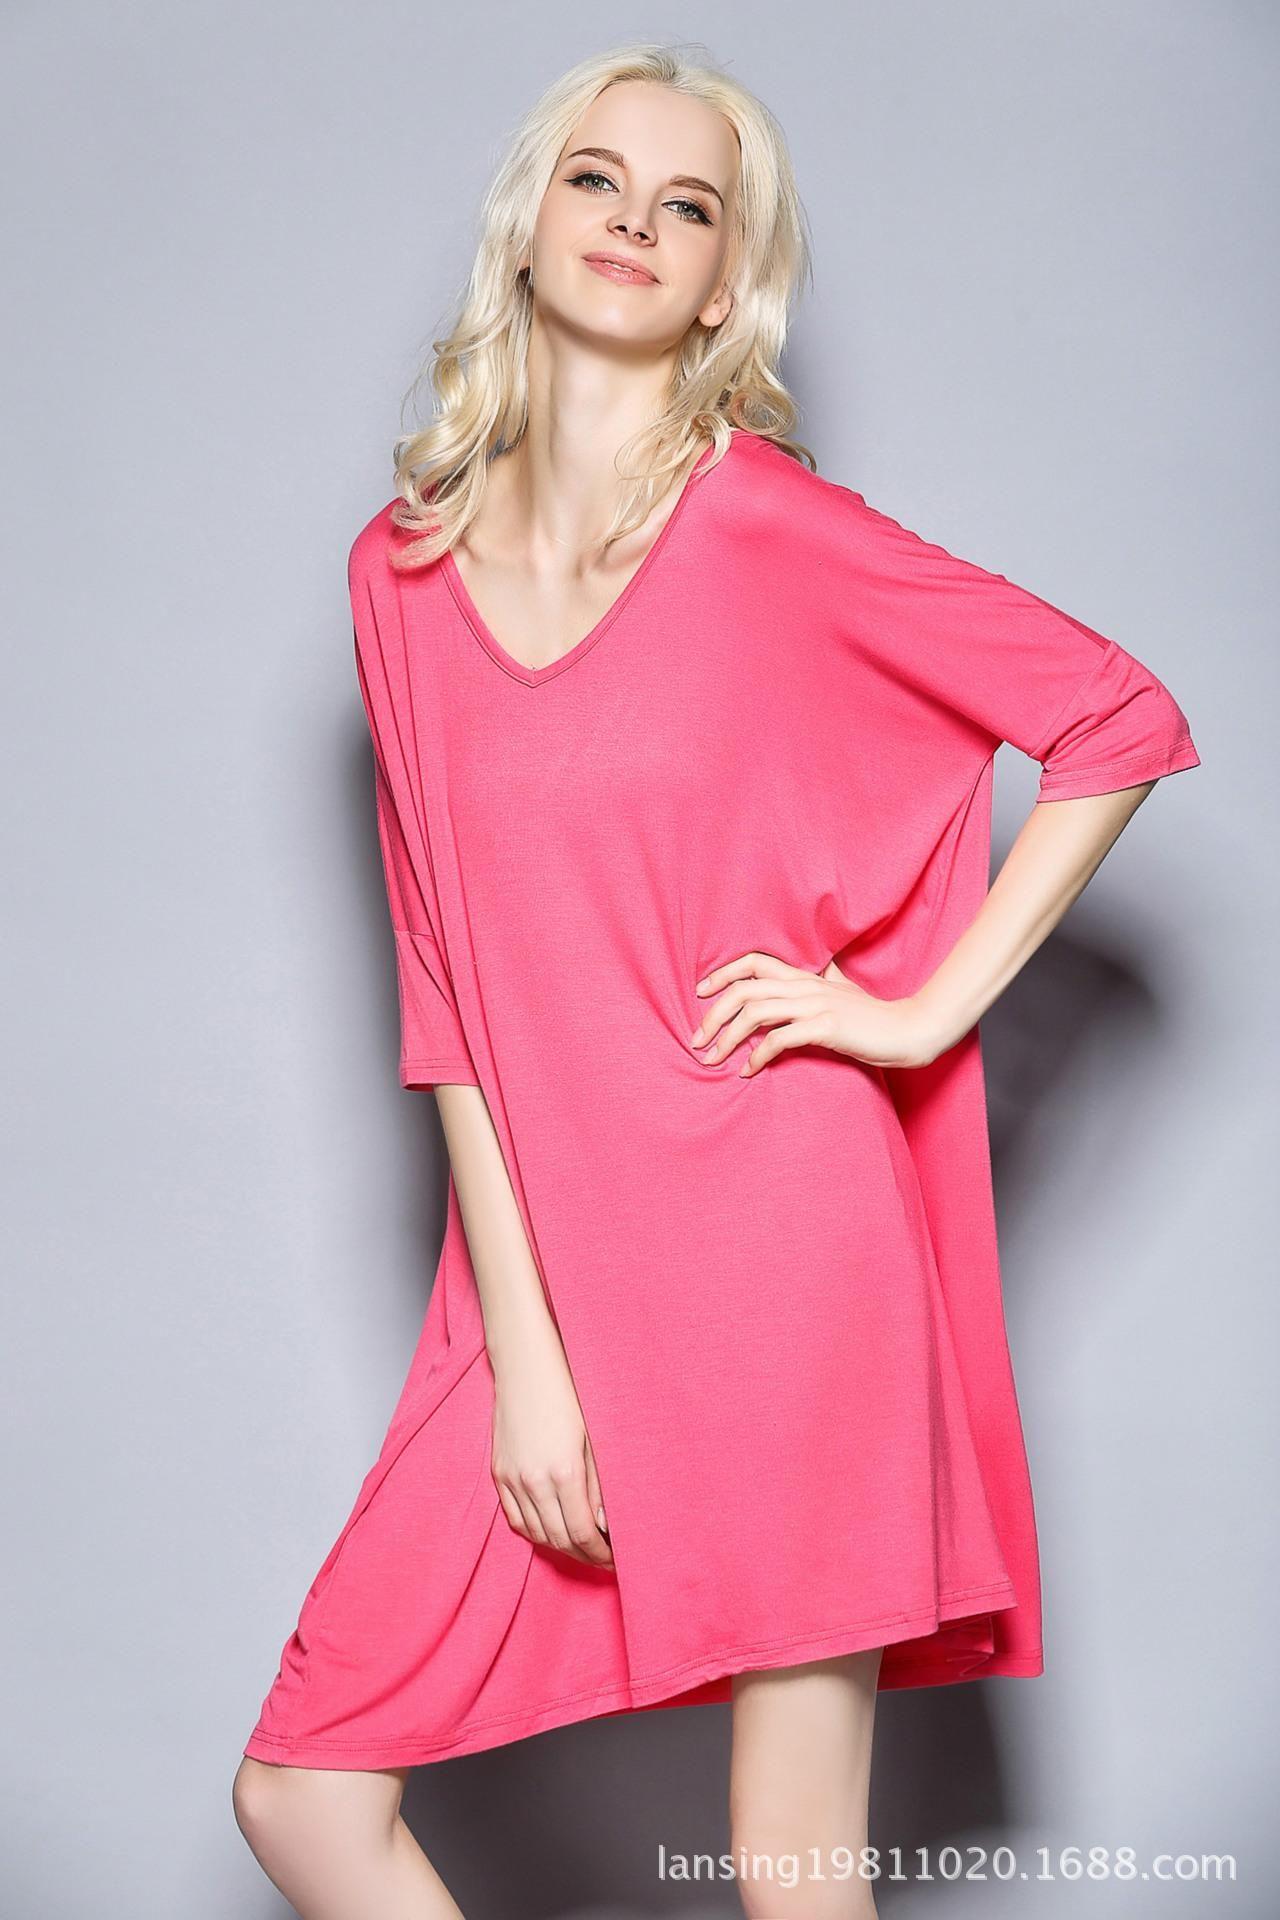 Nightdress spring and summer new medium and long T-shirt medium sleeve large size nightdress modal Pajama has fat plus size women Claret